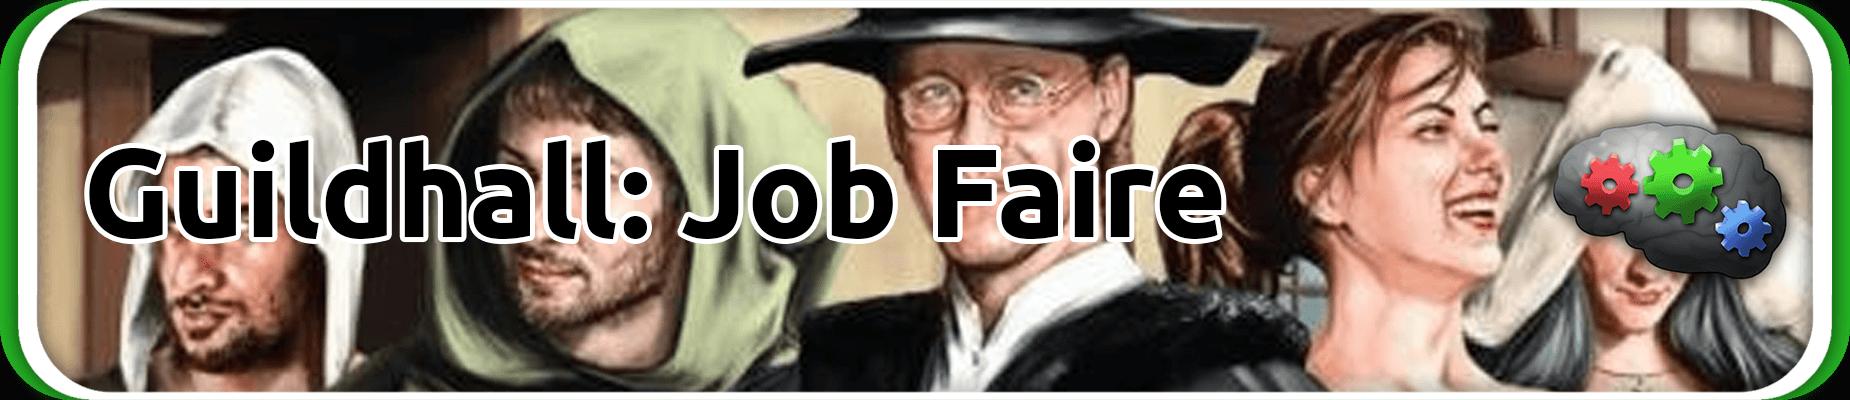 Guild jobF